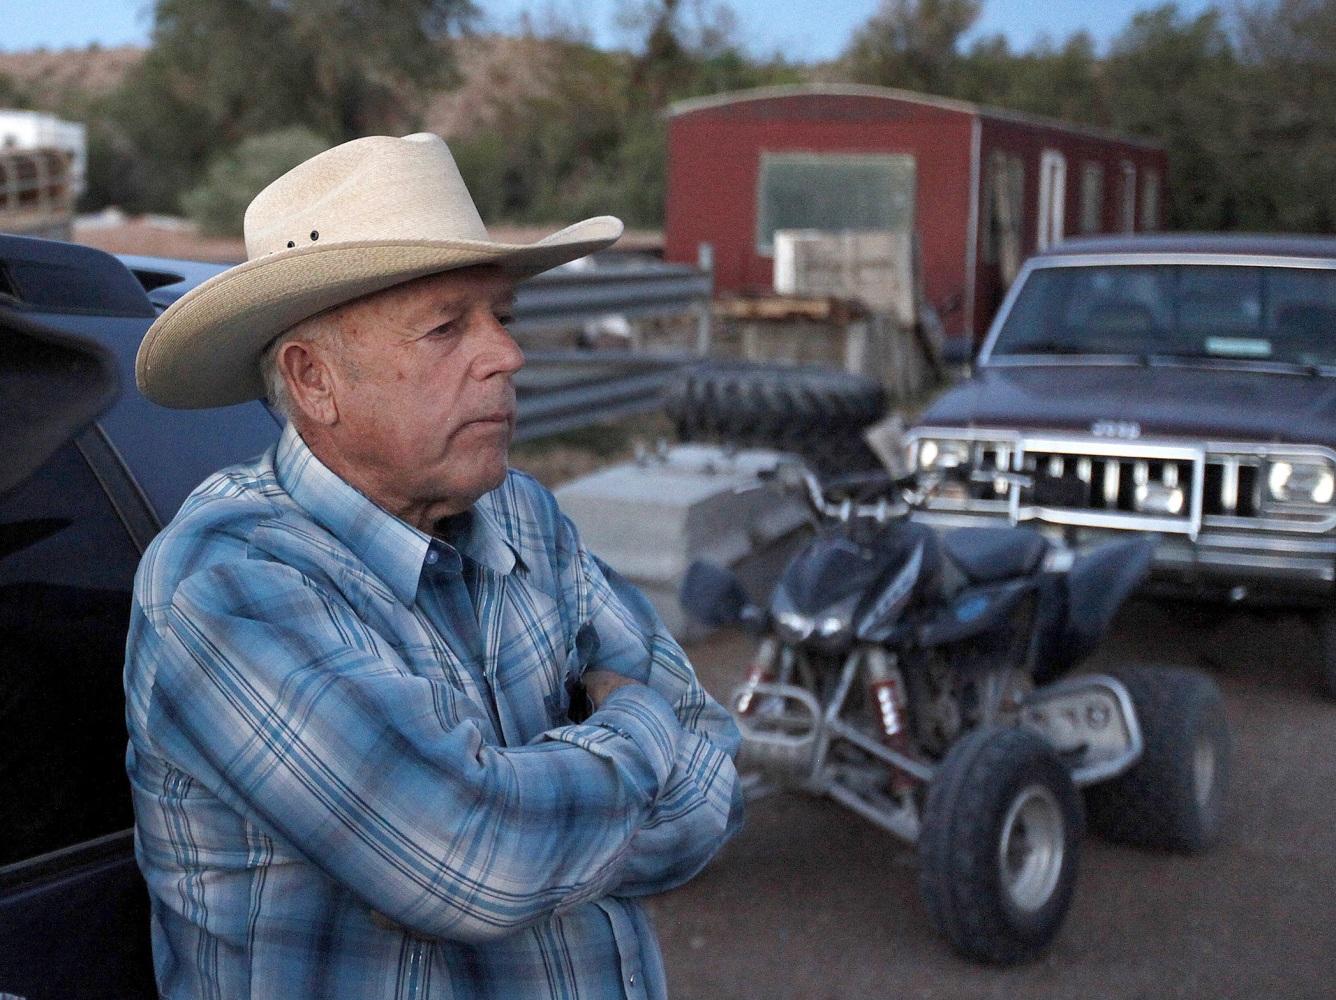 Mistrial declared in 2014 Nevada armed standoff